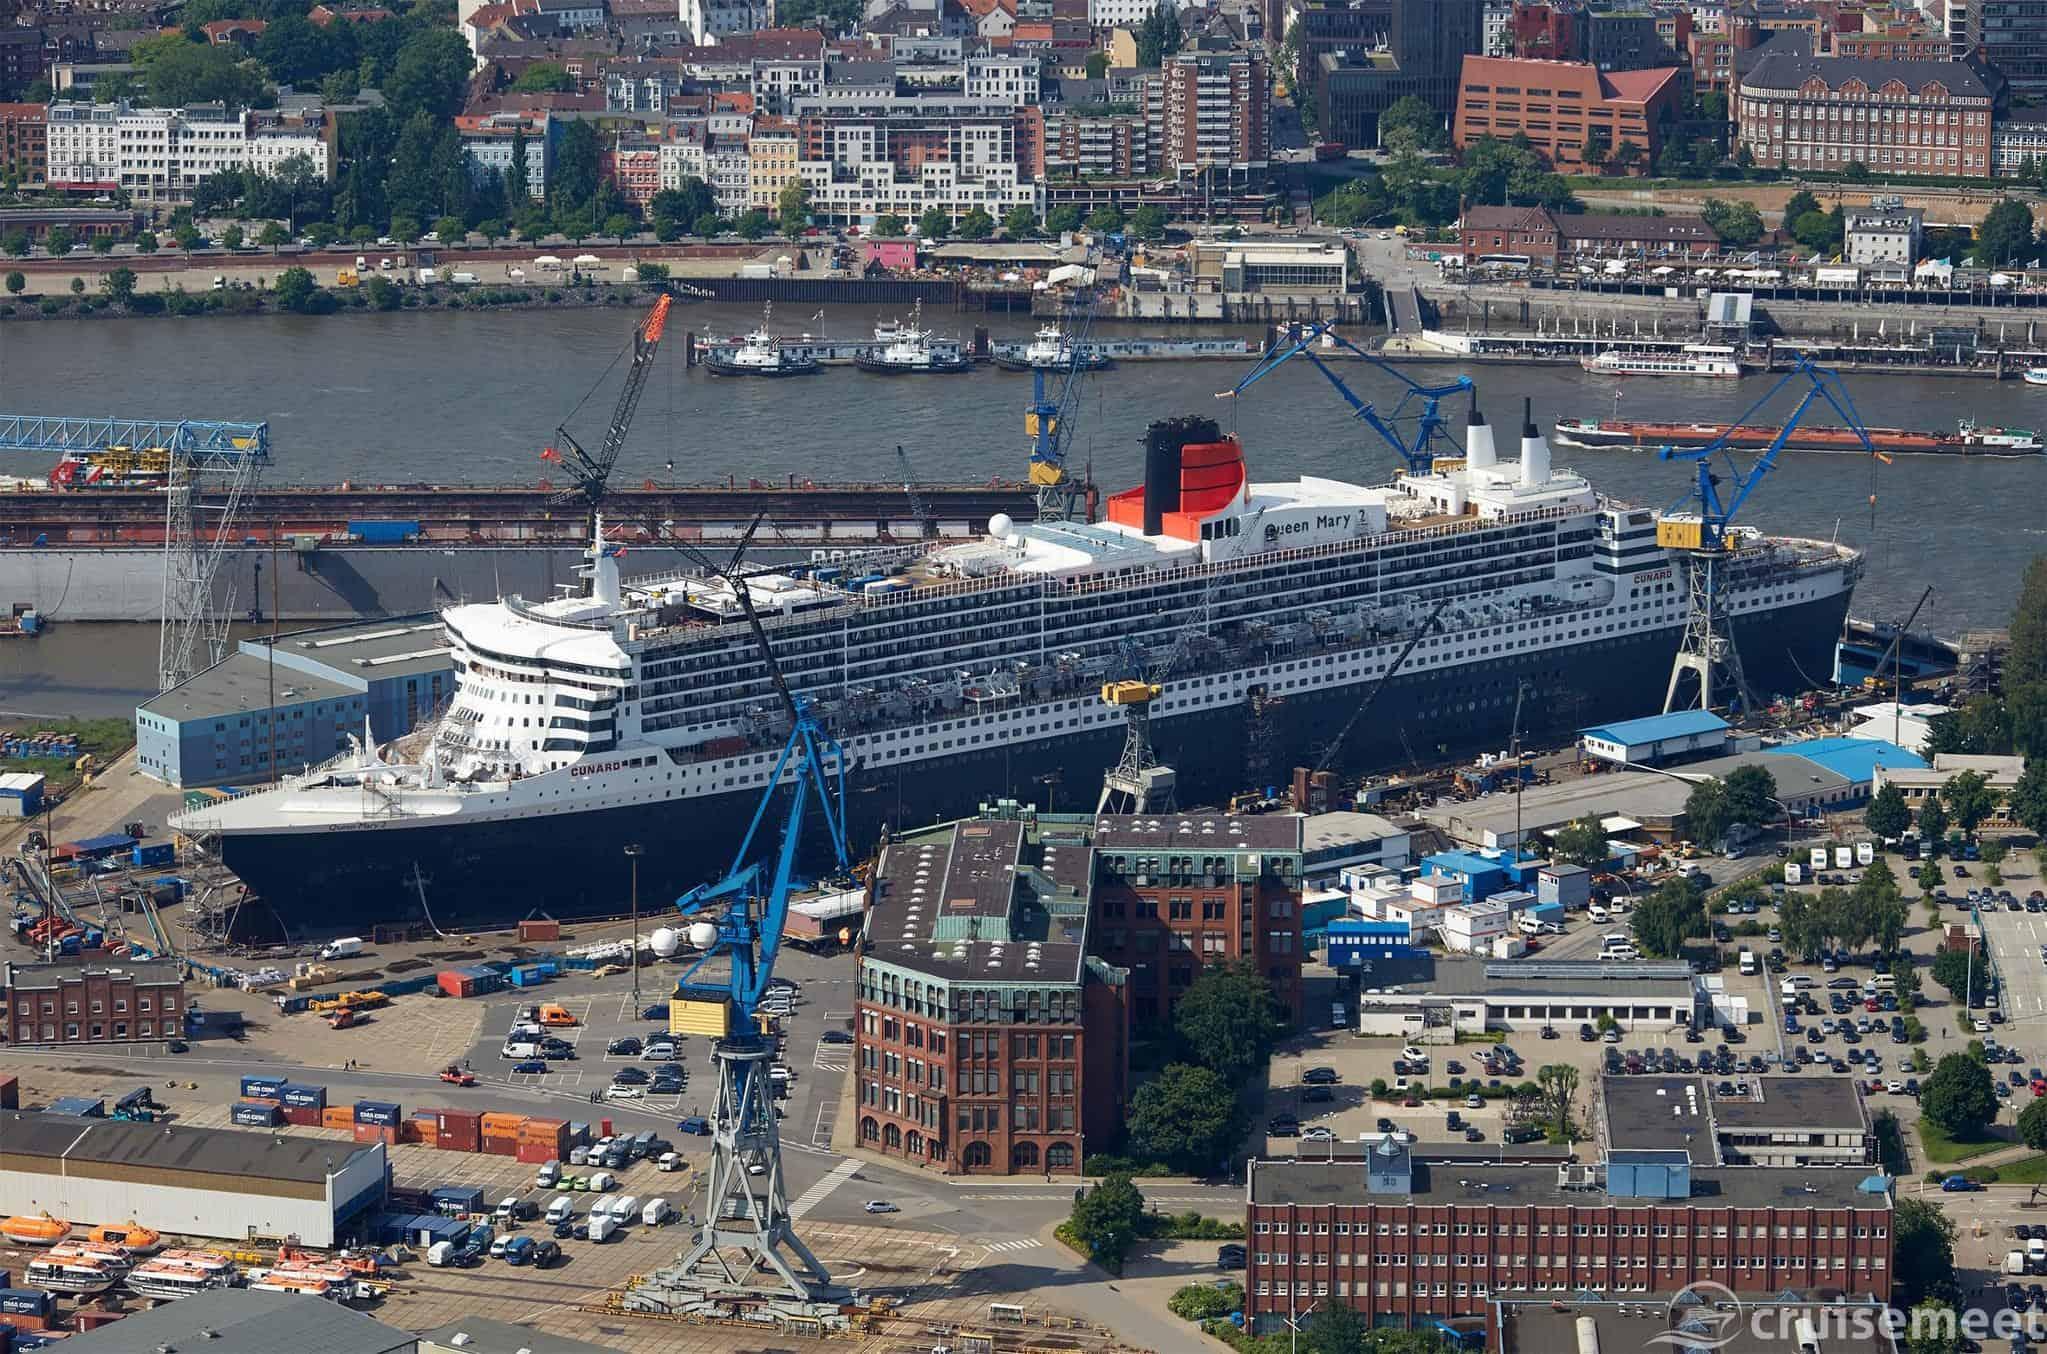 Queen Mary 2 in Drydock Elbe 17, Hamburg